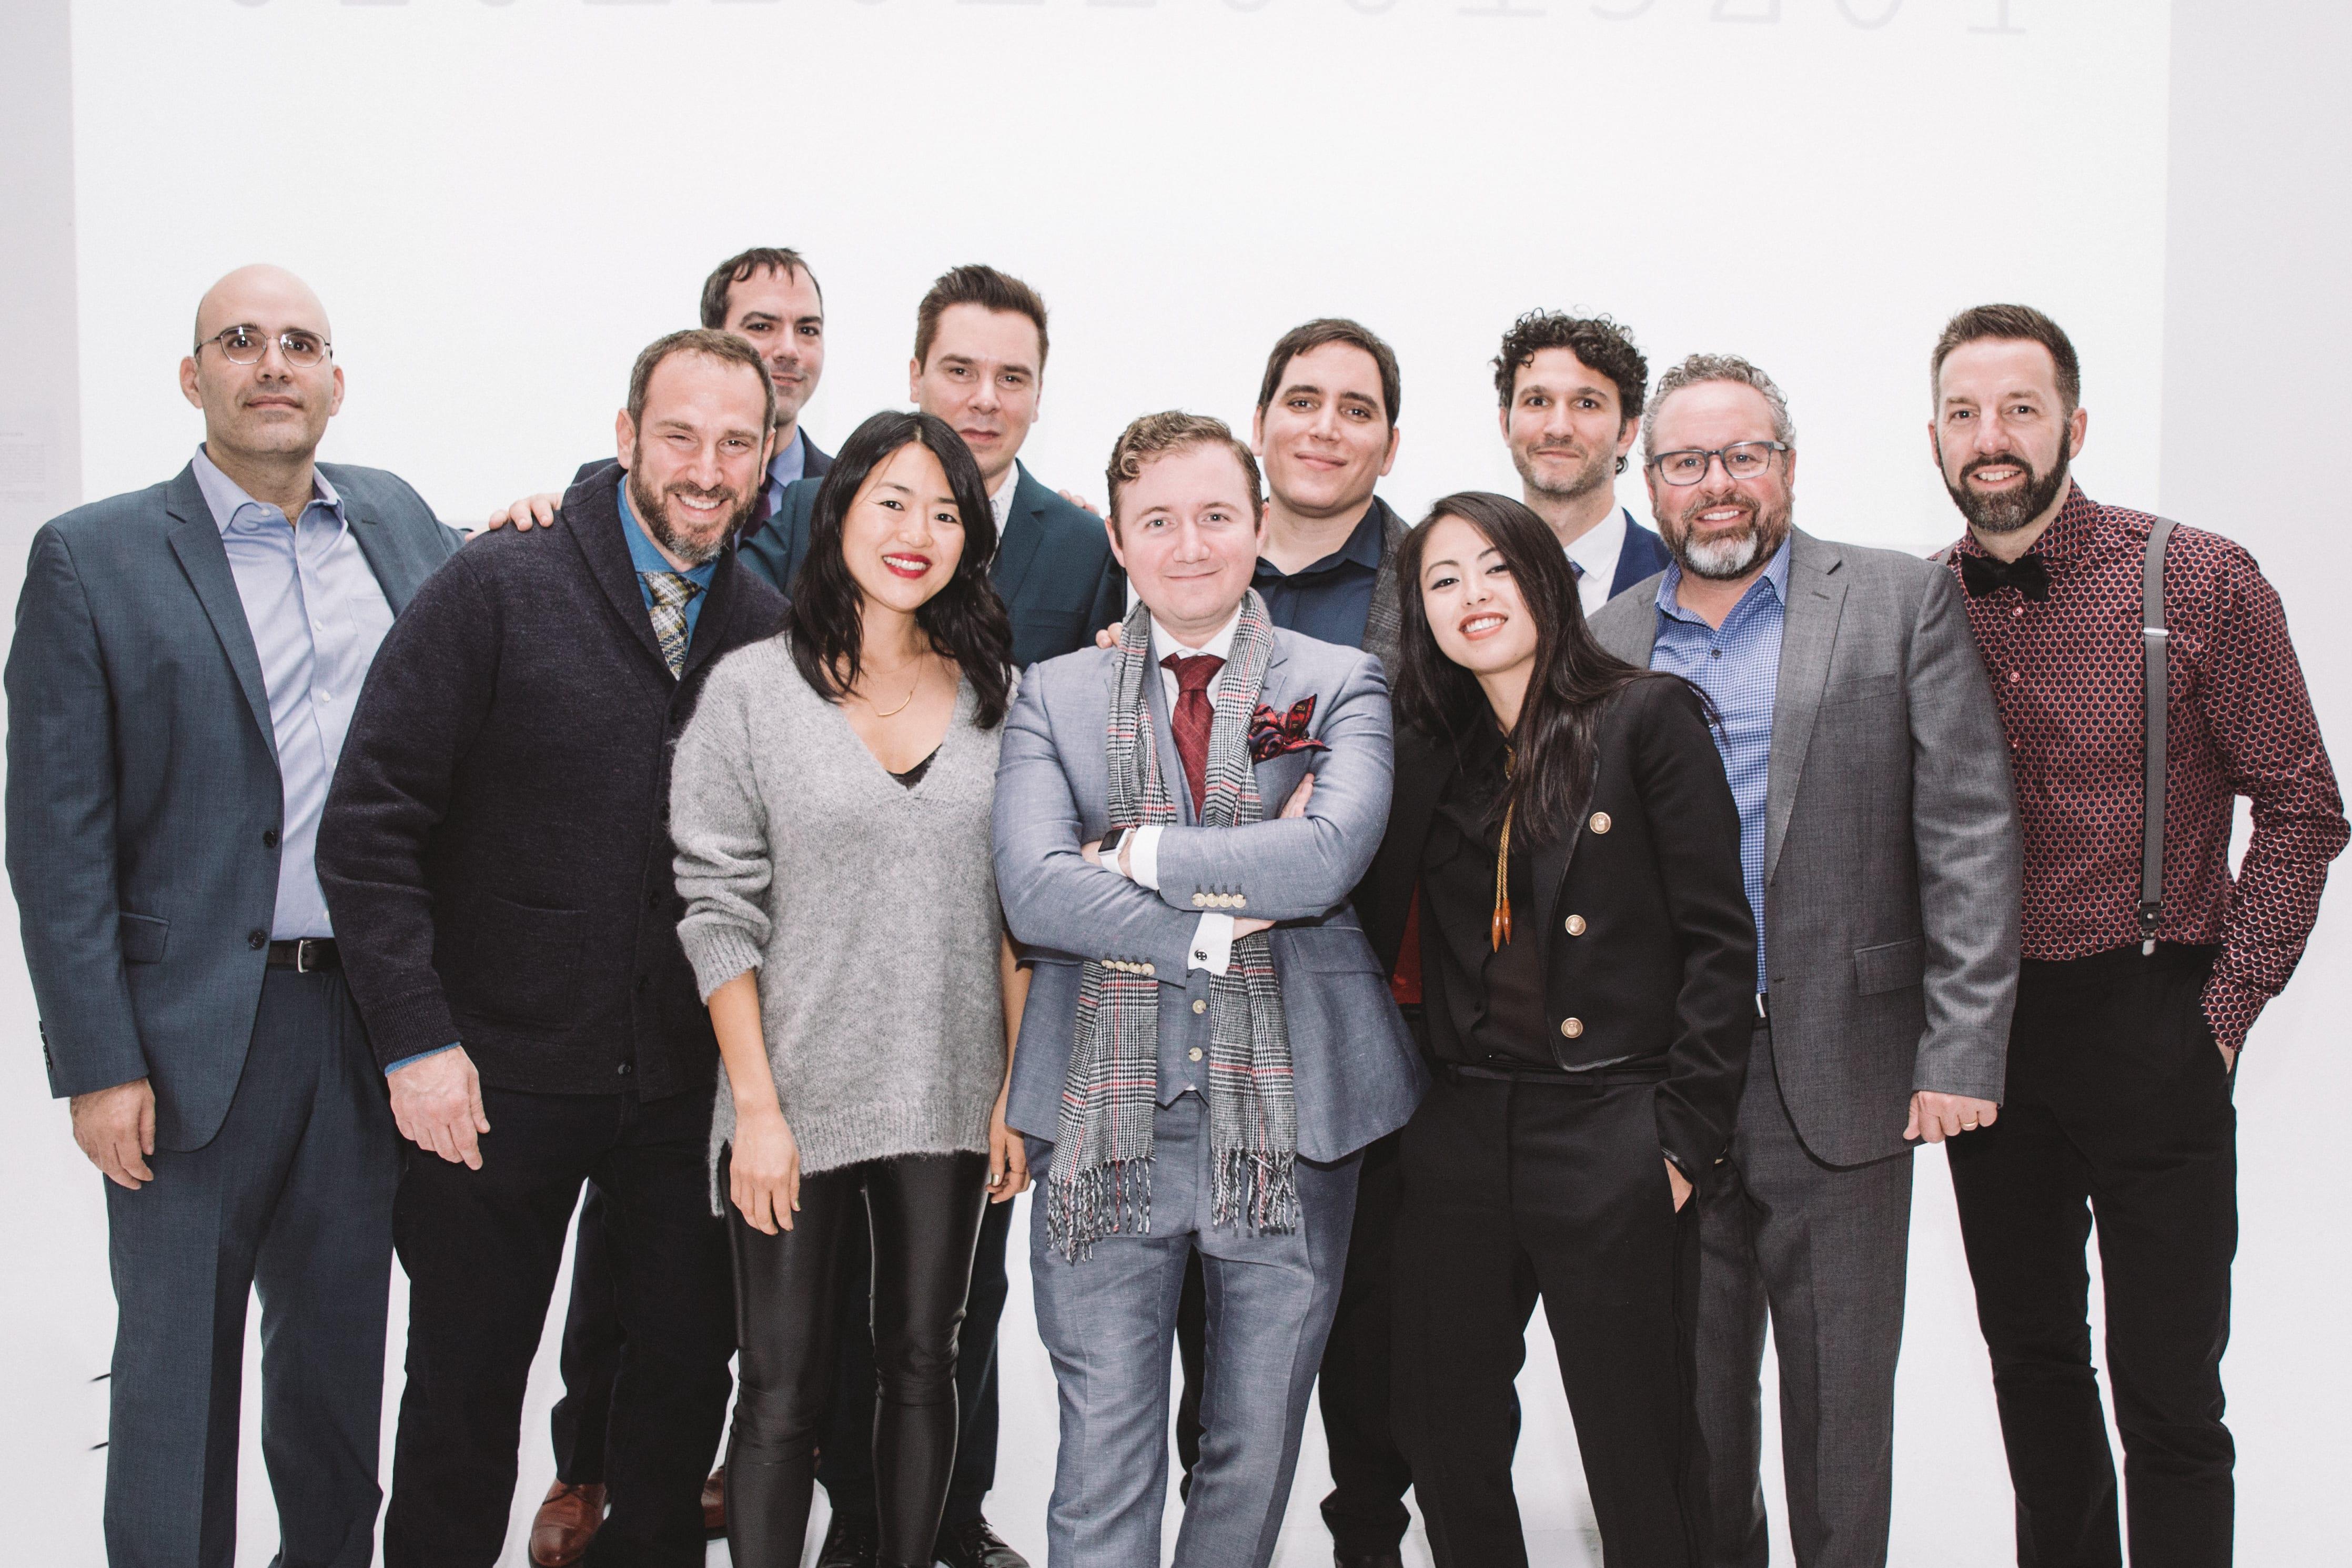 Downtown music publishing team.